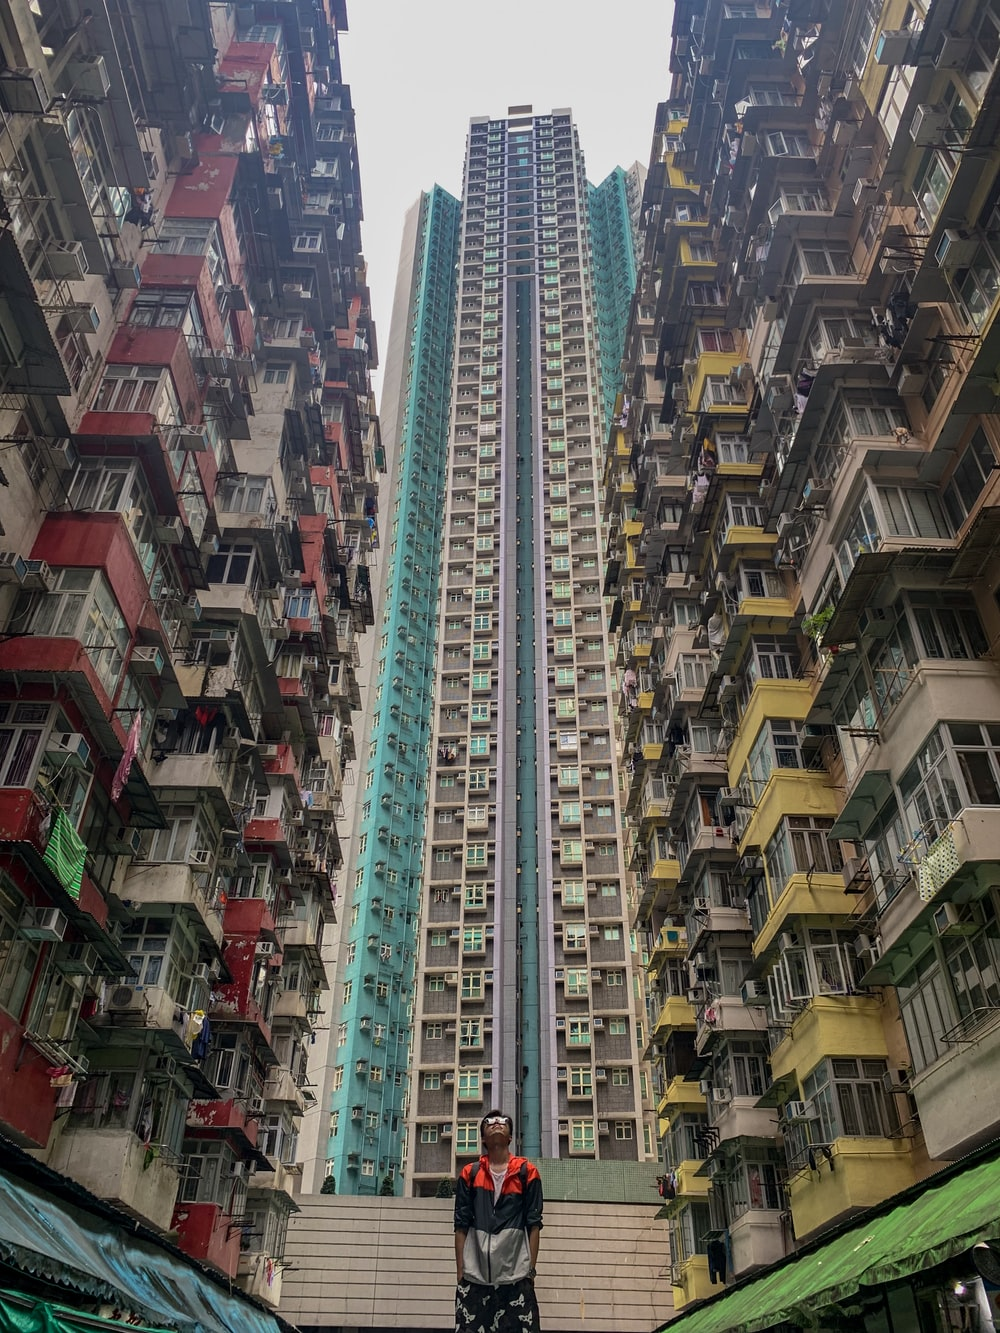 man standing in between of high-rise buildings